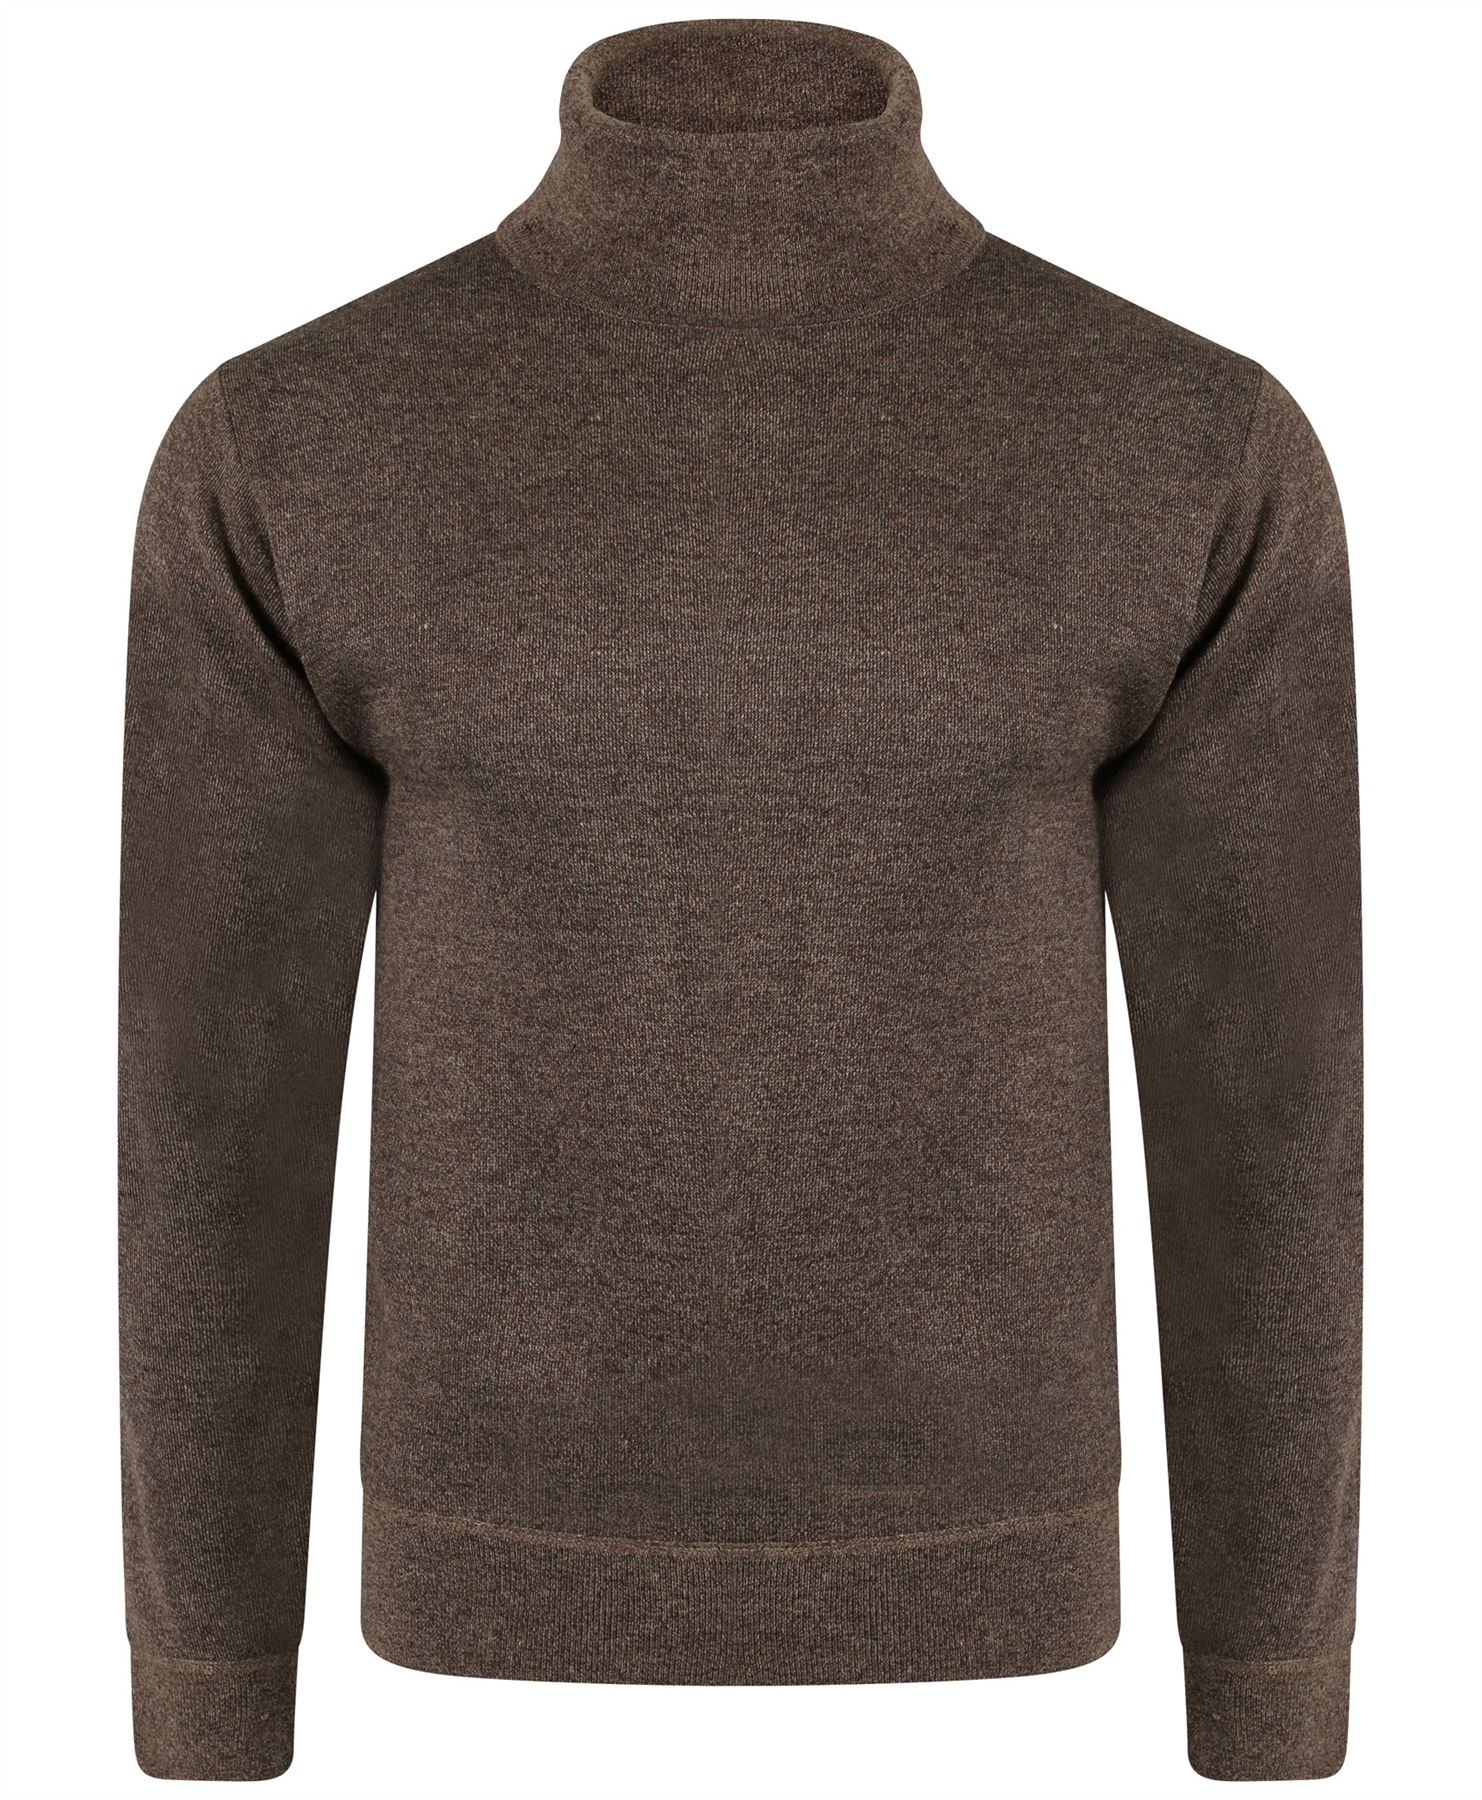 Knitting Pattern Plain Jumper : Mens Plain Turtleneck Jumper Long Sleeve Wool Blend Knit Pullover Sweater M-X...